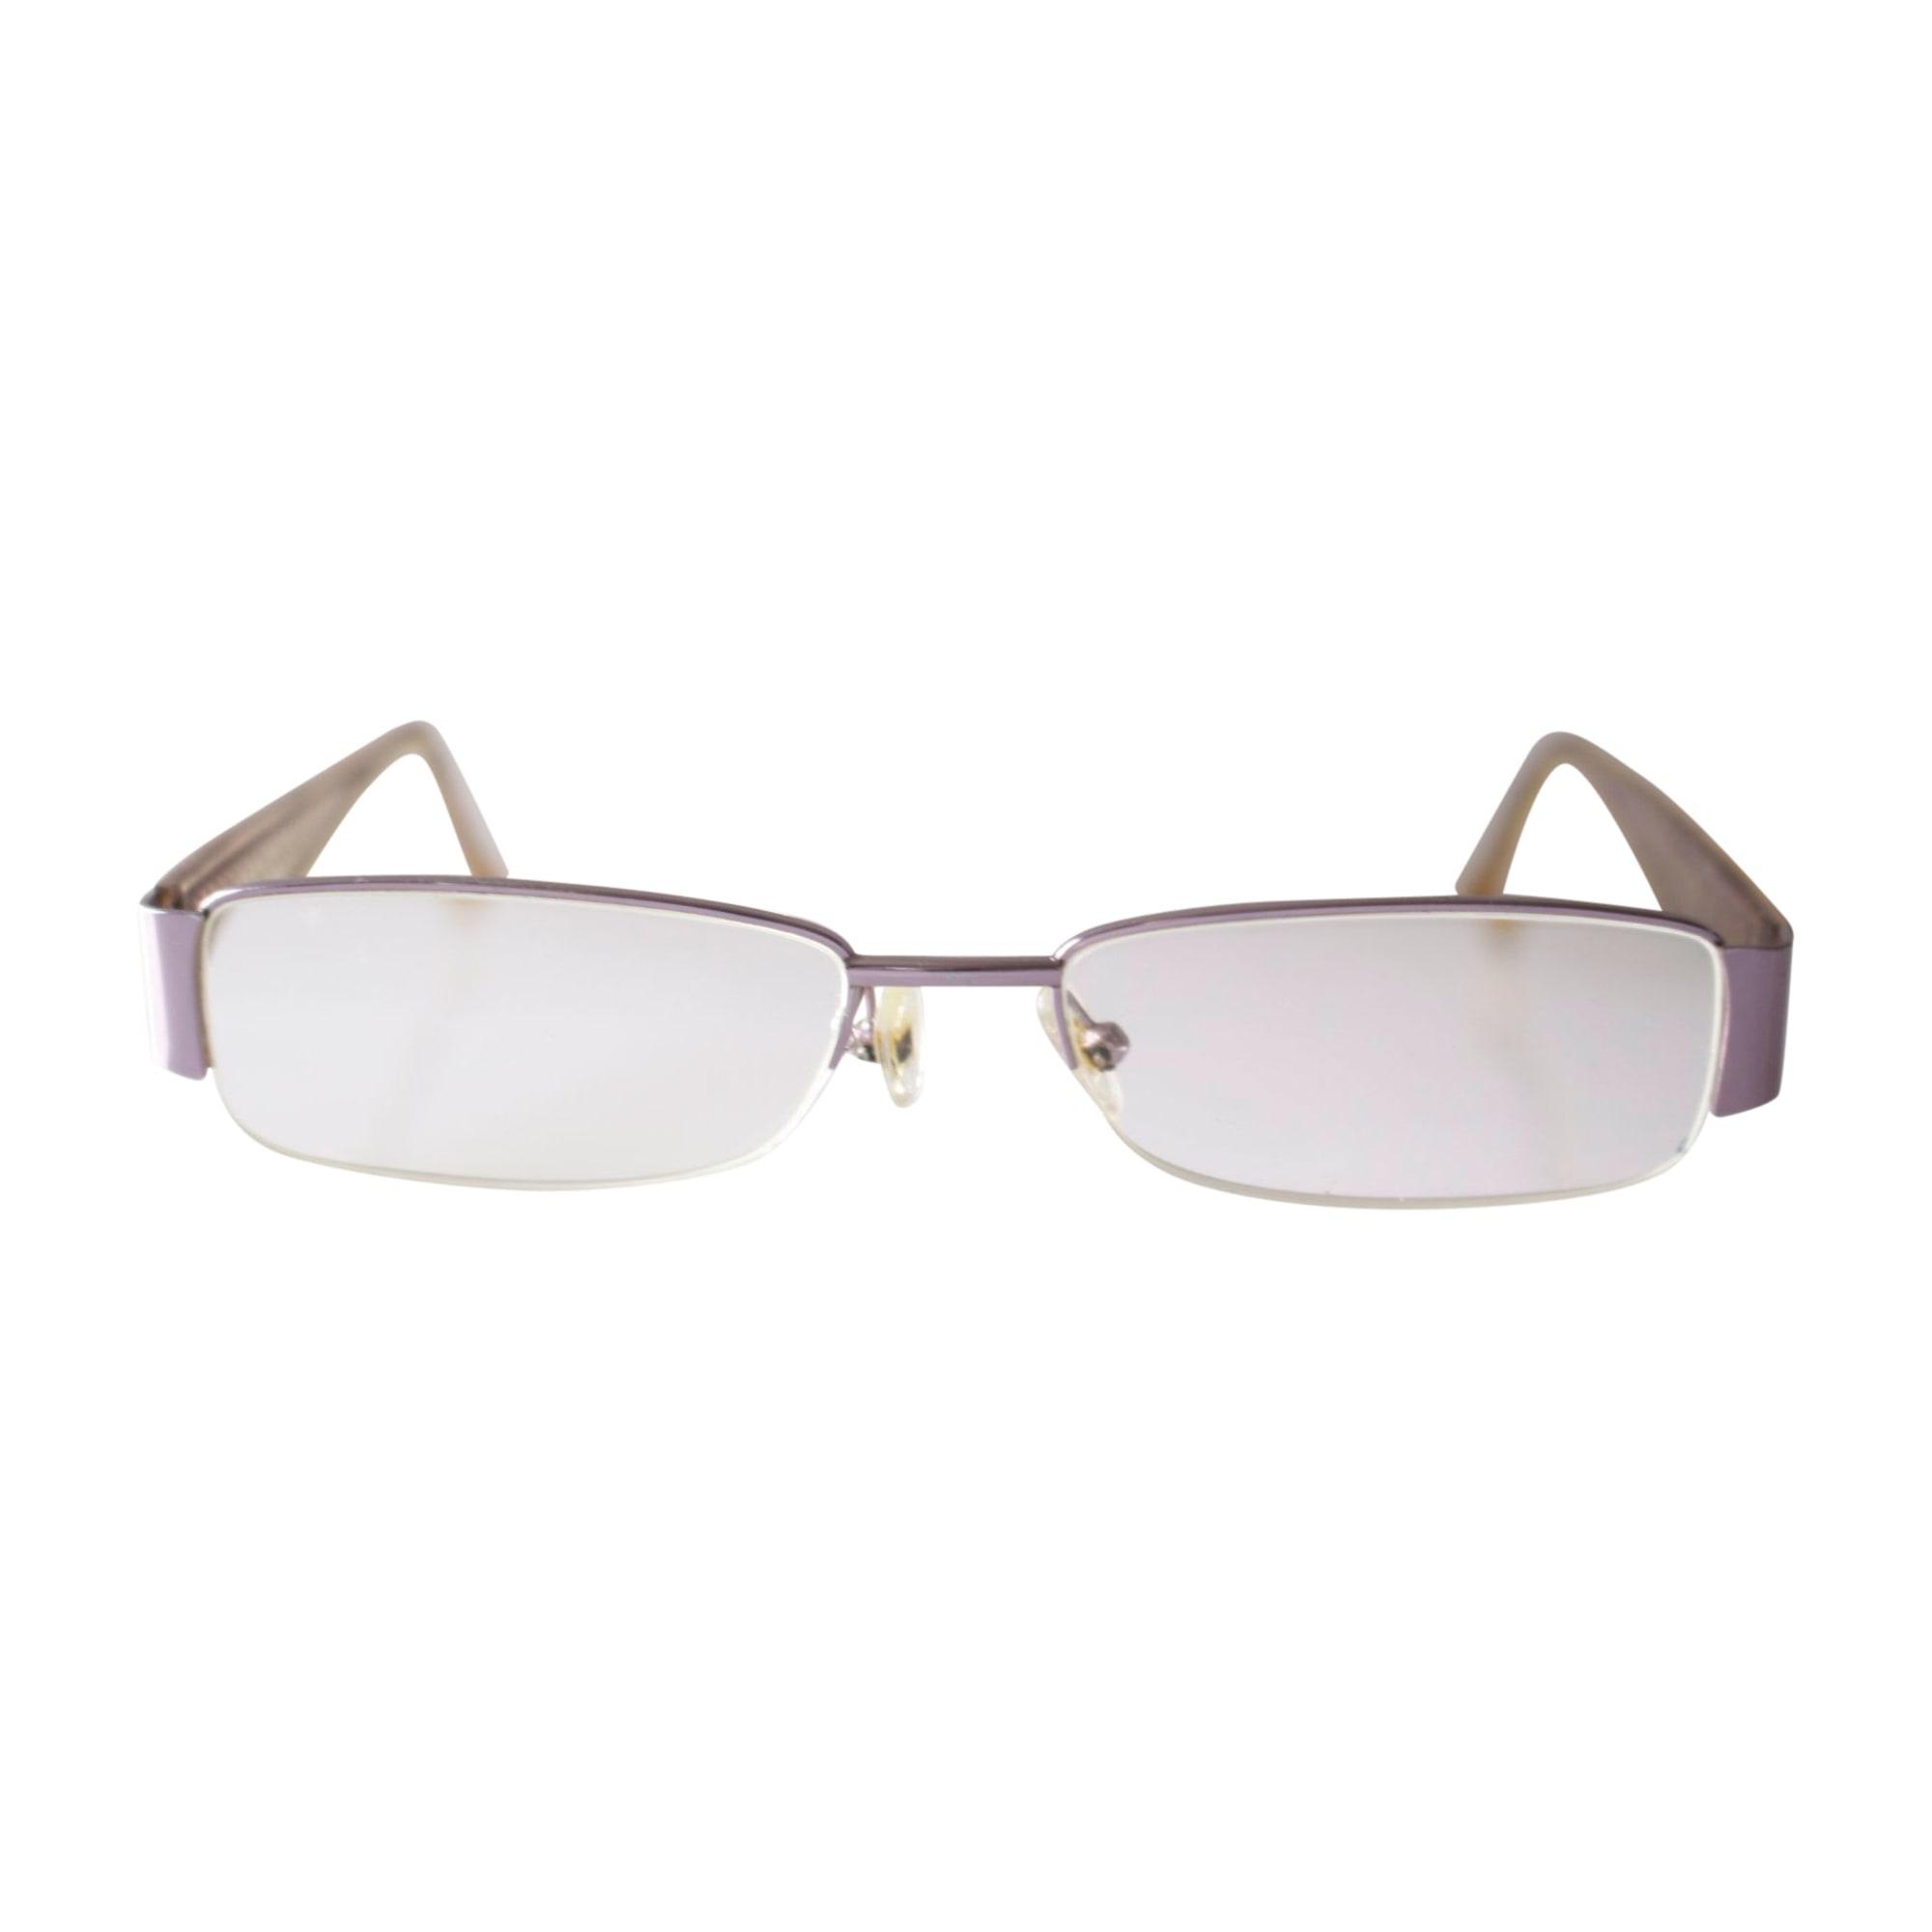 Eyeglass Frames NINA RICCI silver - 7961558